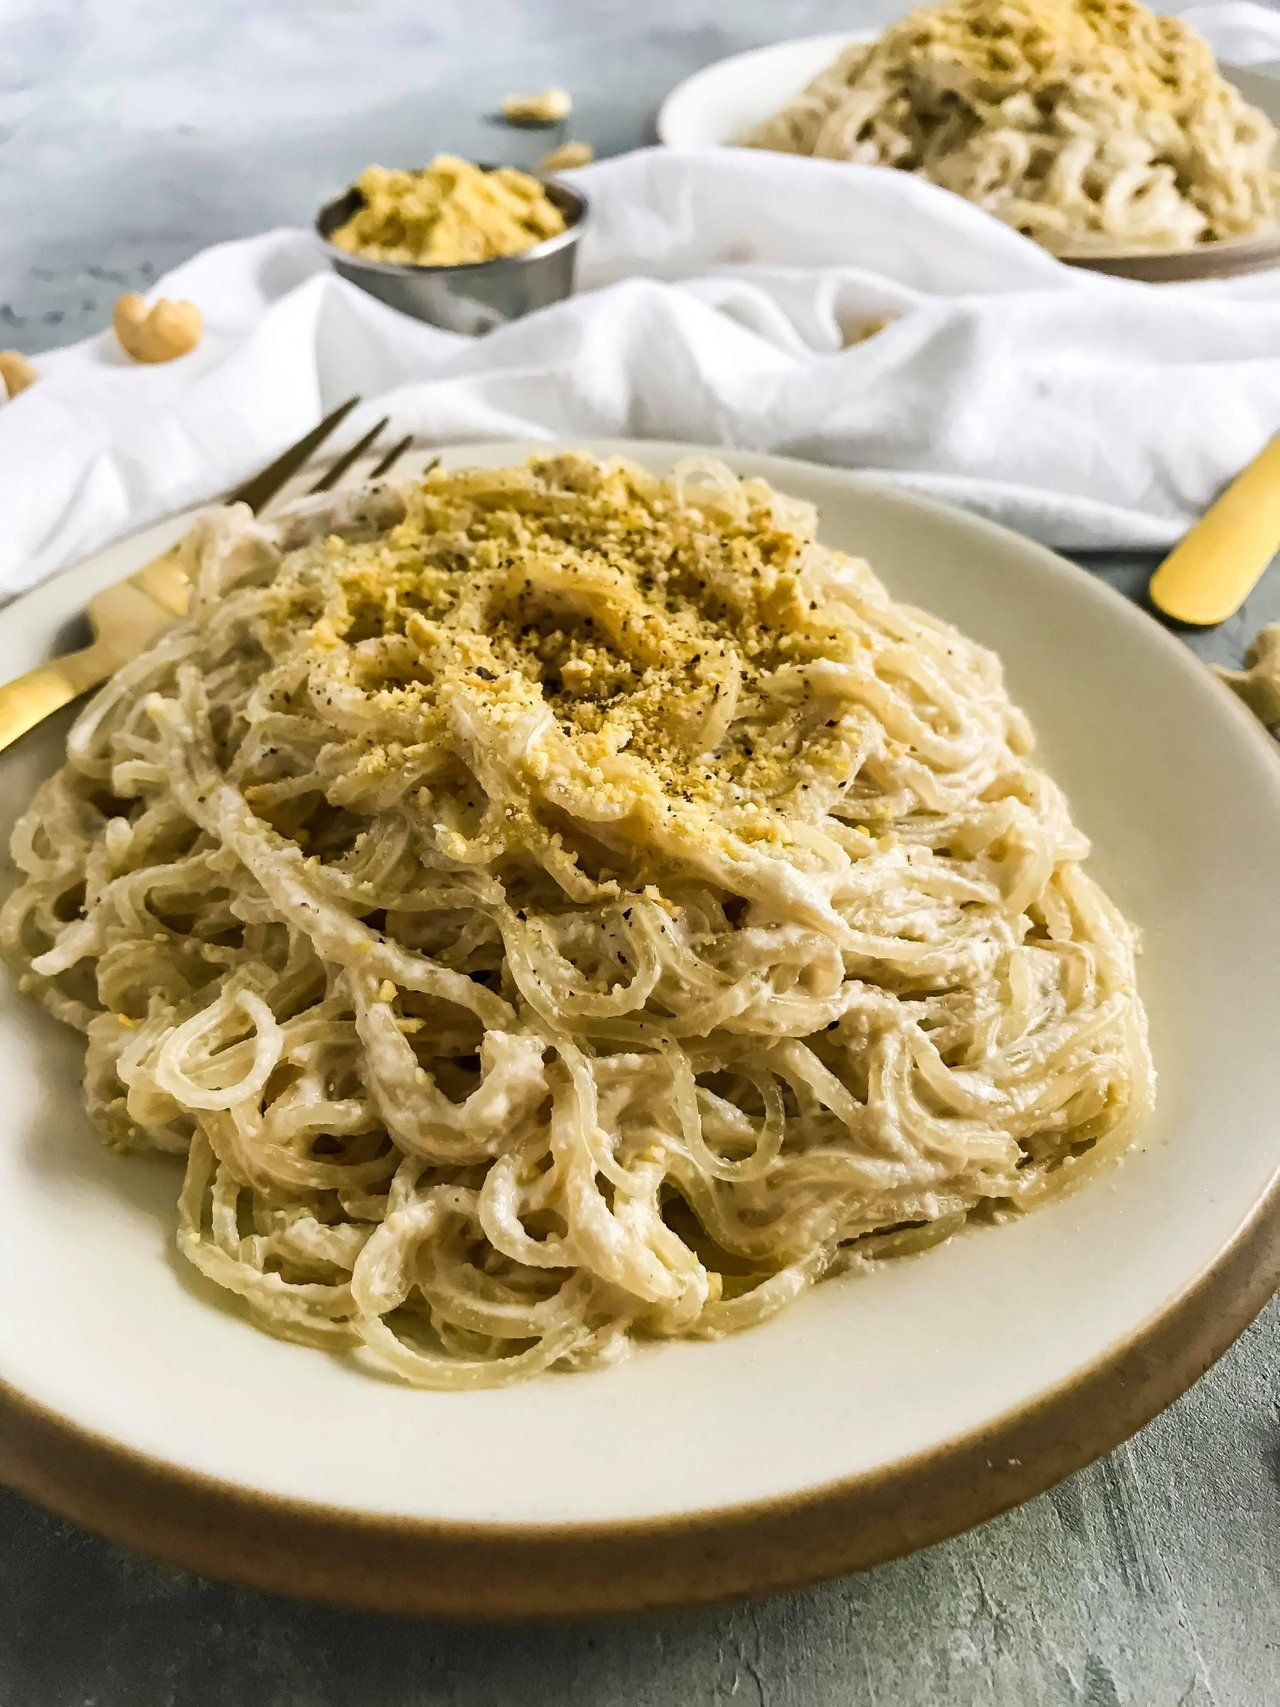 Raw Vegan Creamy Alfredo Sauce Recipe Kelp Noodle Hack Food Photography Steemit In 2020 Vegan Alfredo Raw Food Recipes Recipes